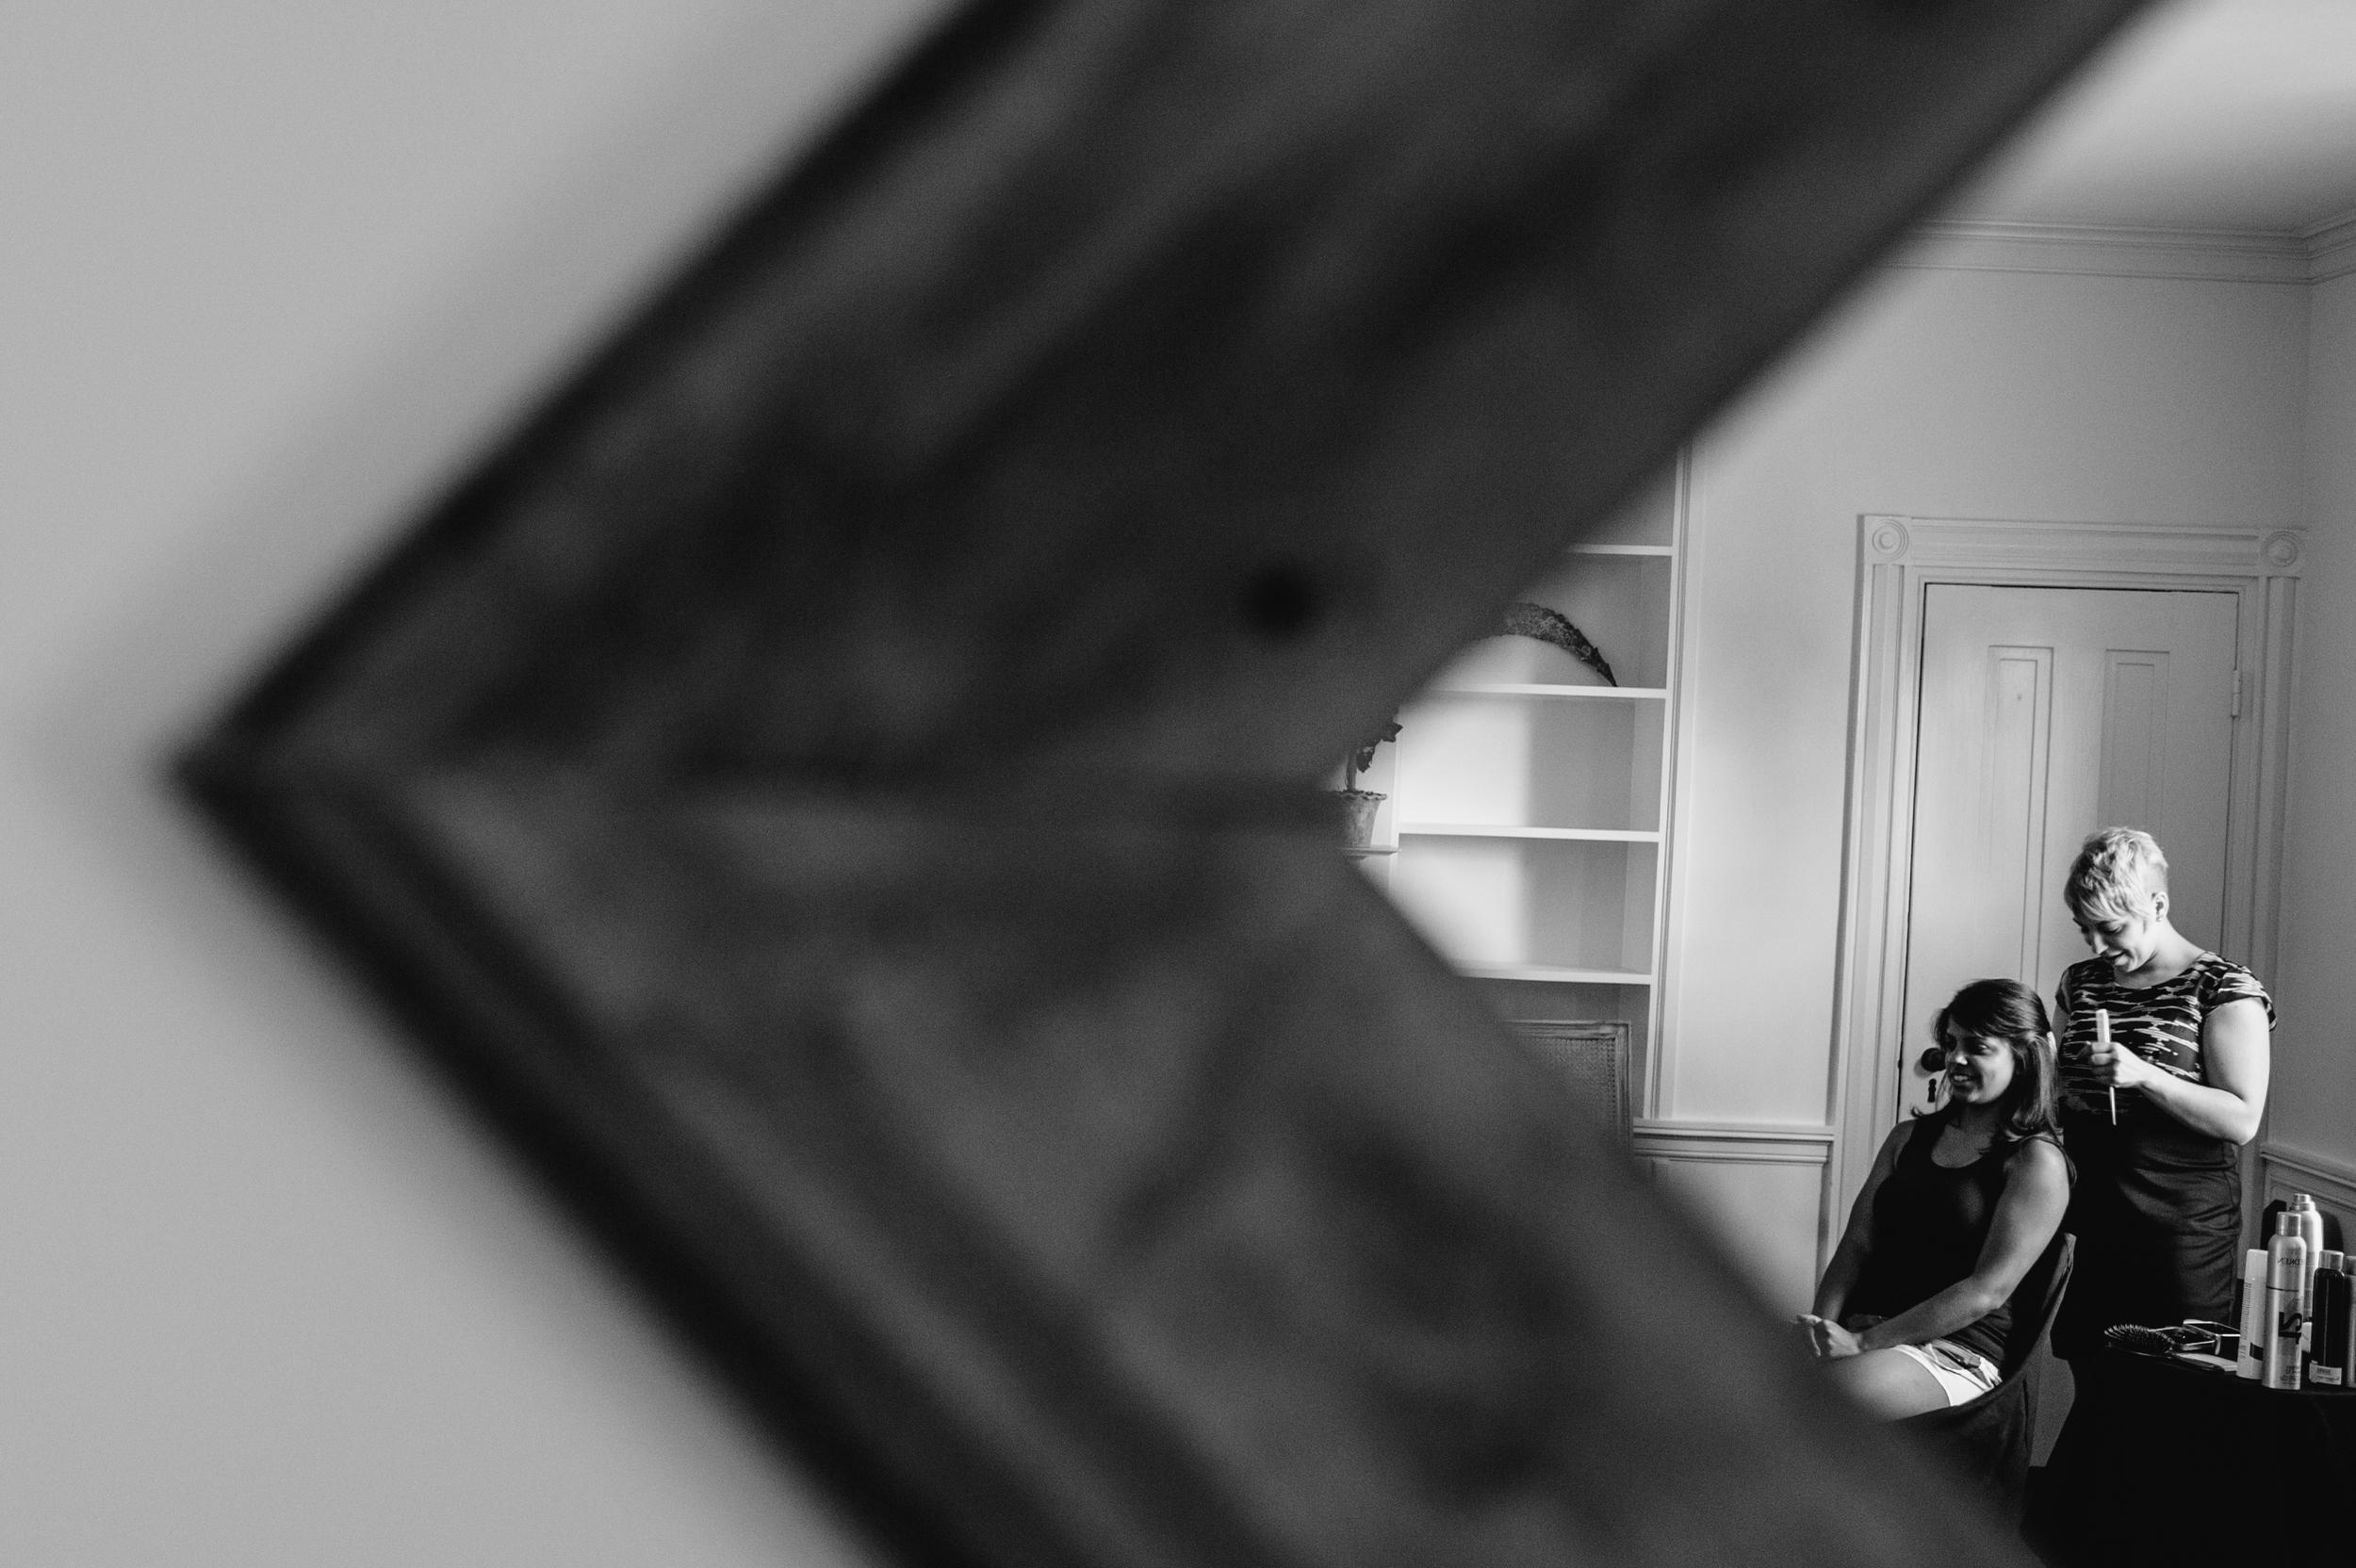 Artistic Wedding Photographer Mantas Kubilinskas-2.jpg